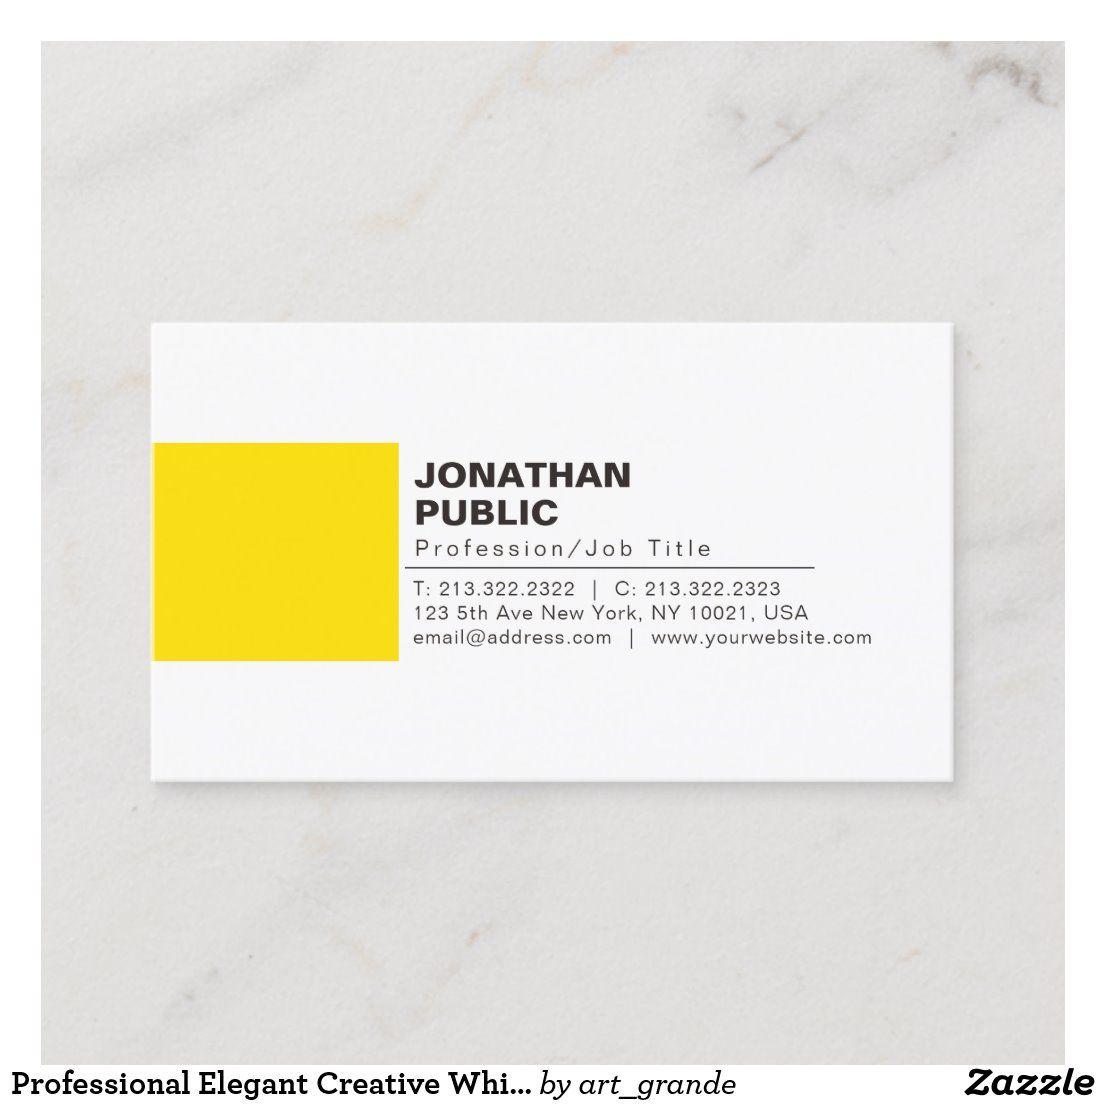 Professional Elegant Creative White Yellow Plain Business Card Zazzle Com In 2021 Business Card Inspiration Cool Business Cards Business Cards Creative